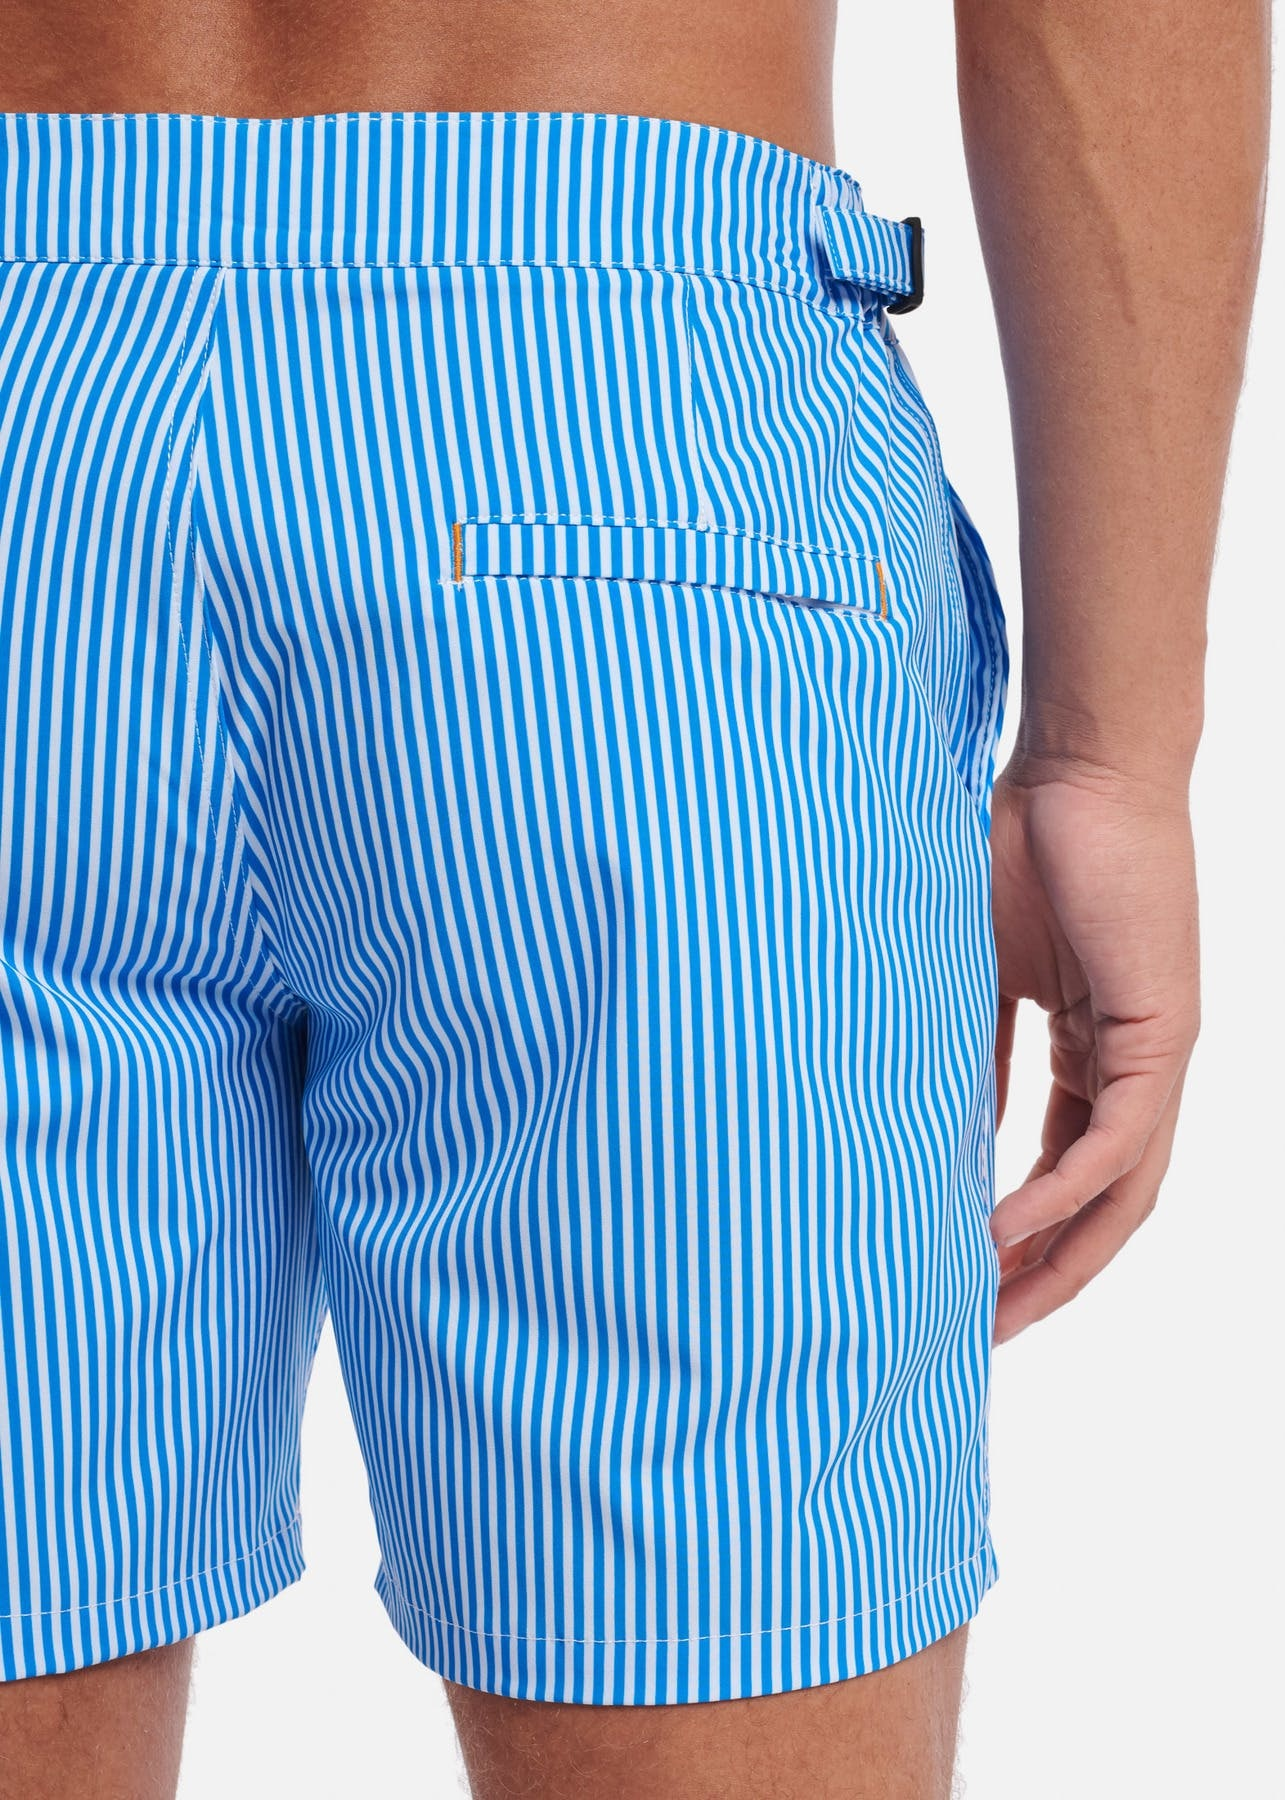 SHIWI Shiwi Easyfit Pinstripe Stretch Swimshort Blue